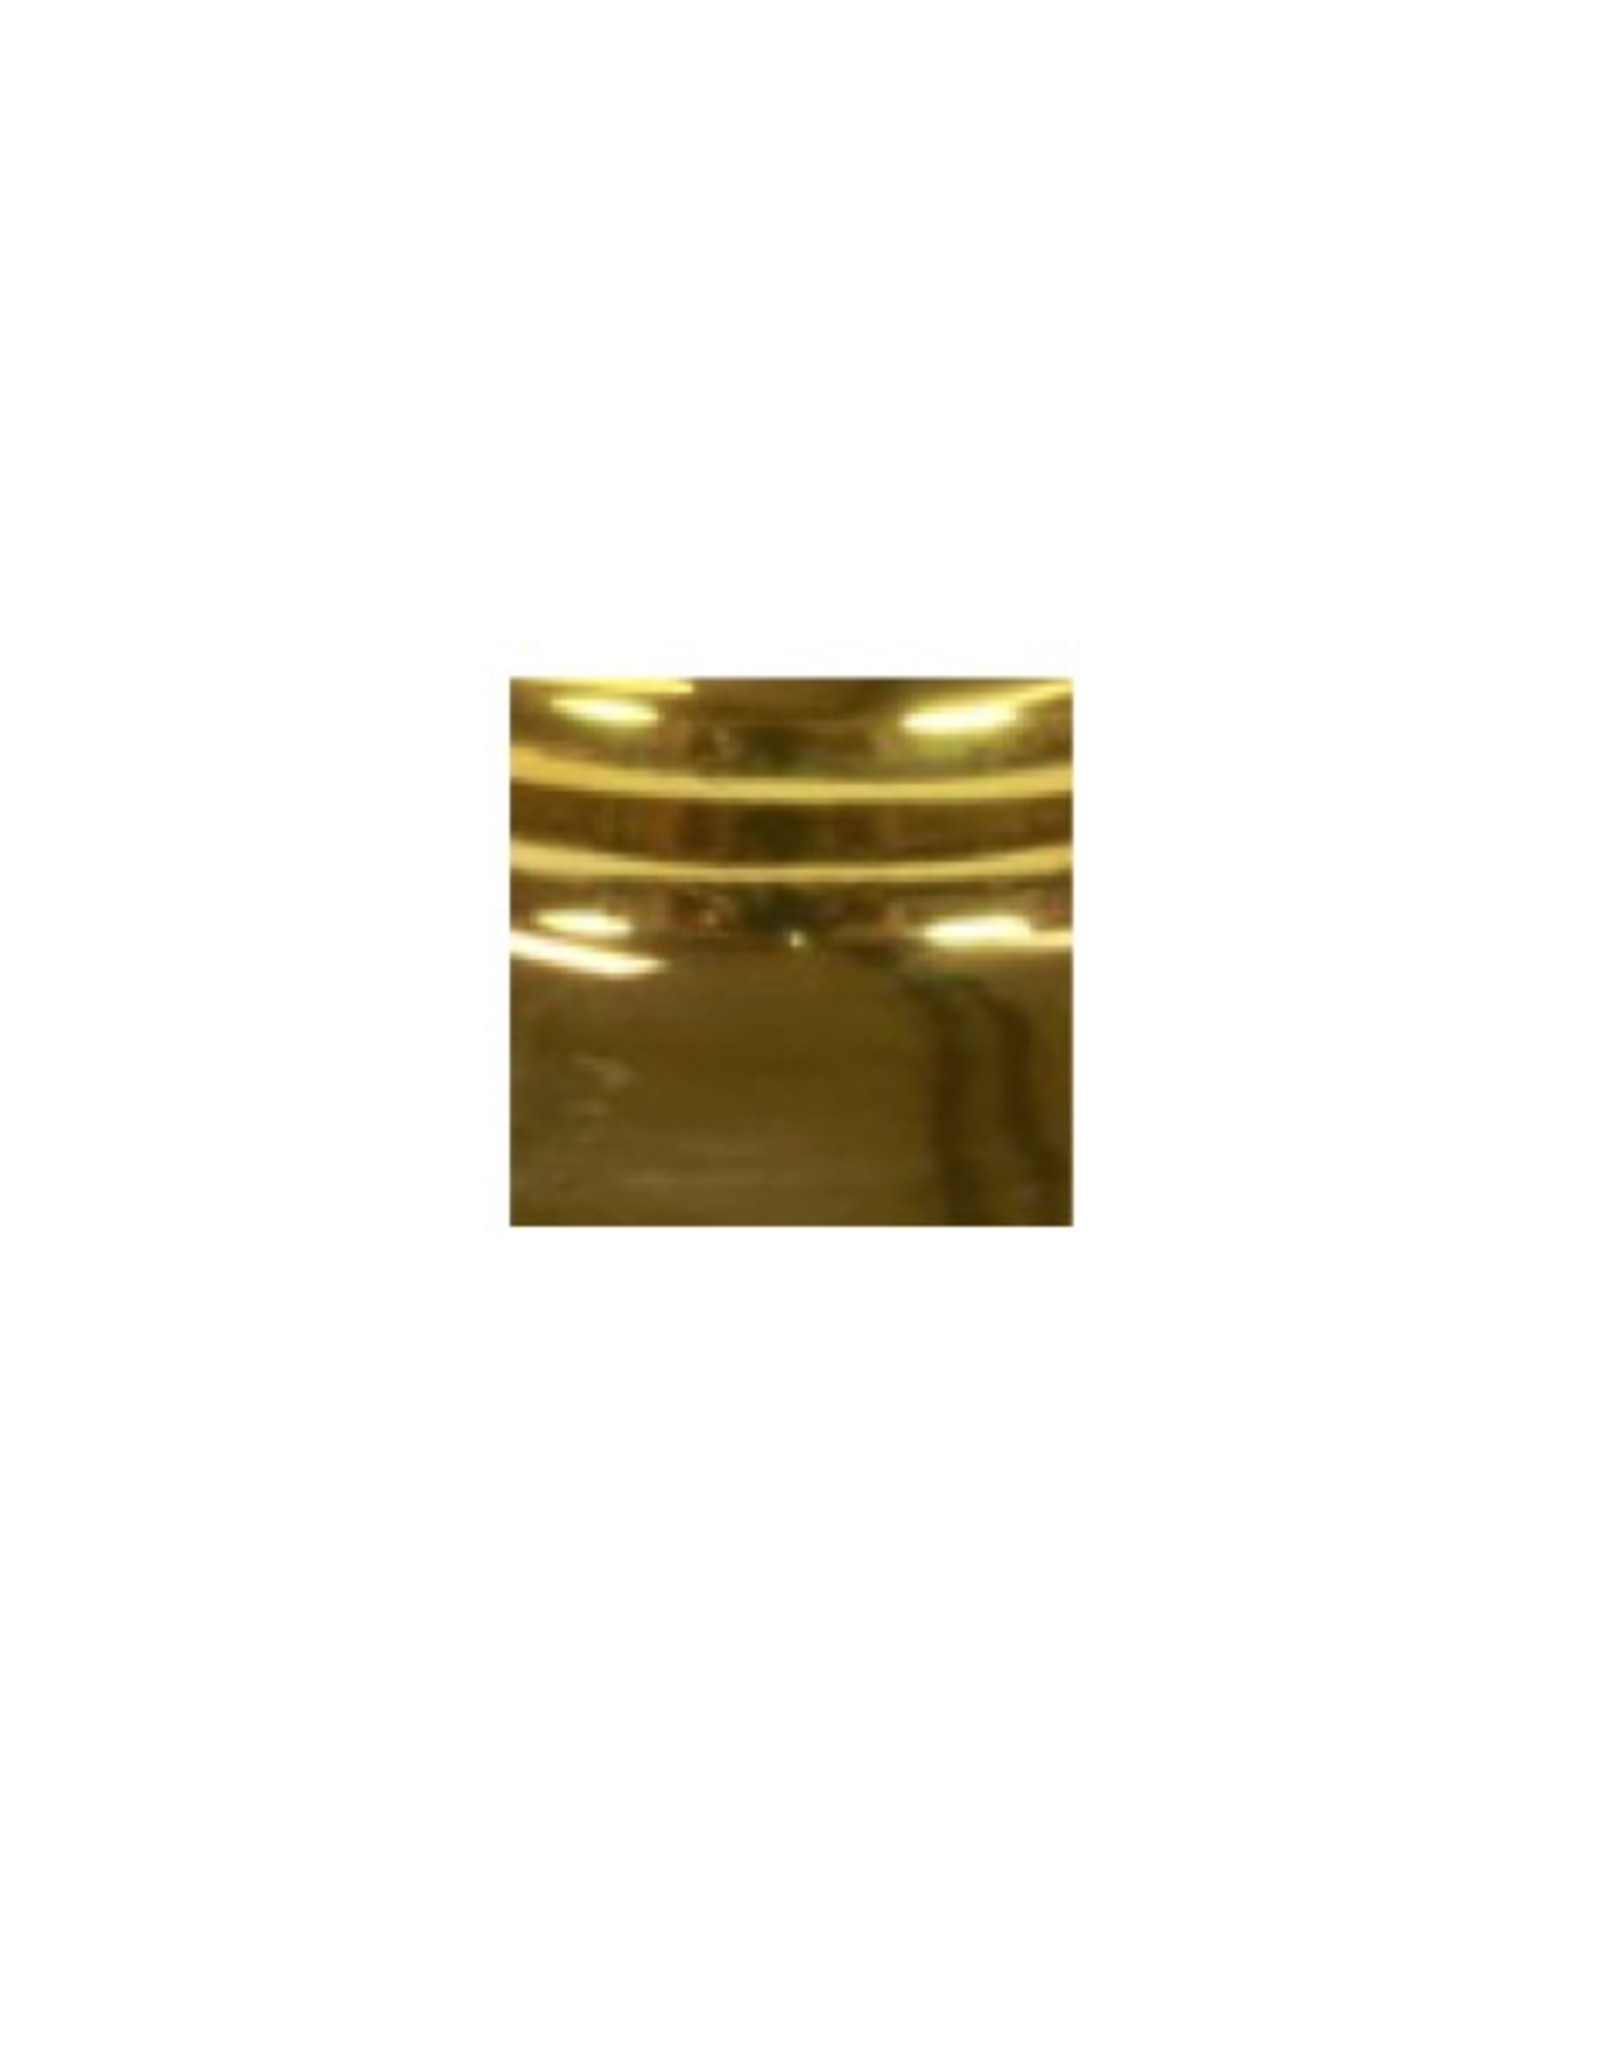 Bright Gold Lustre 10% - 10g